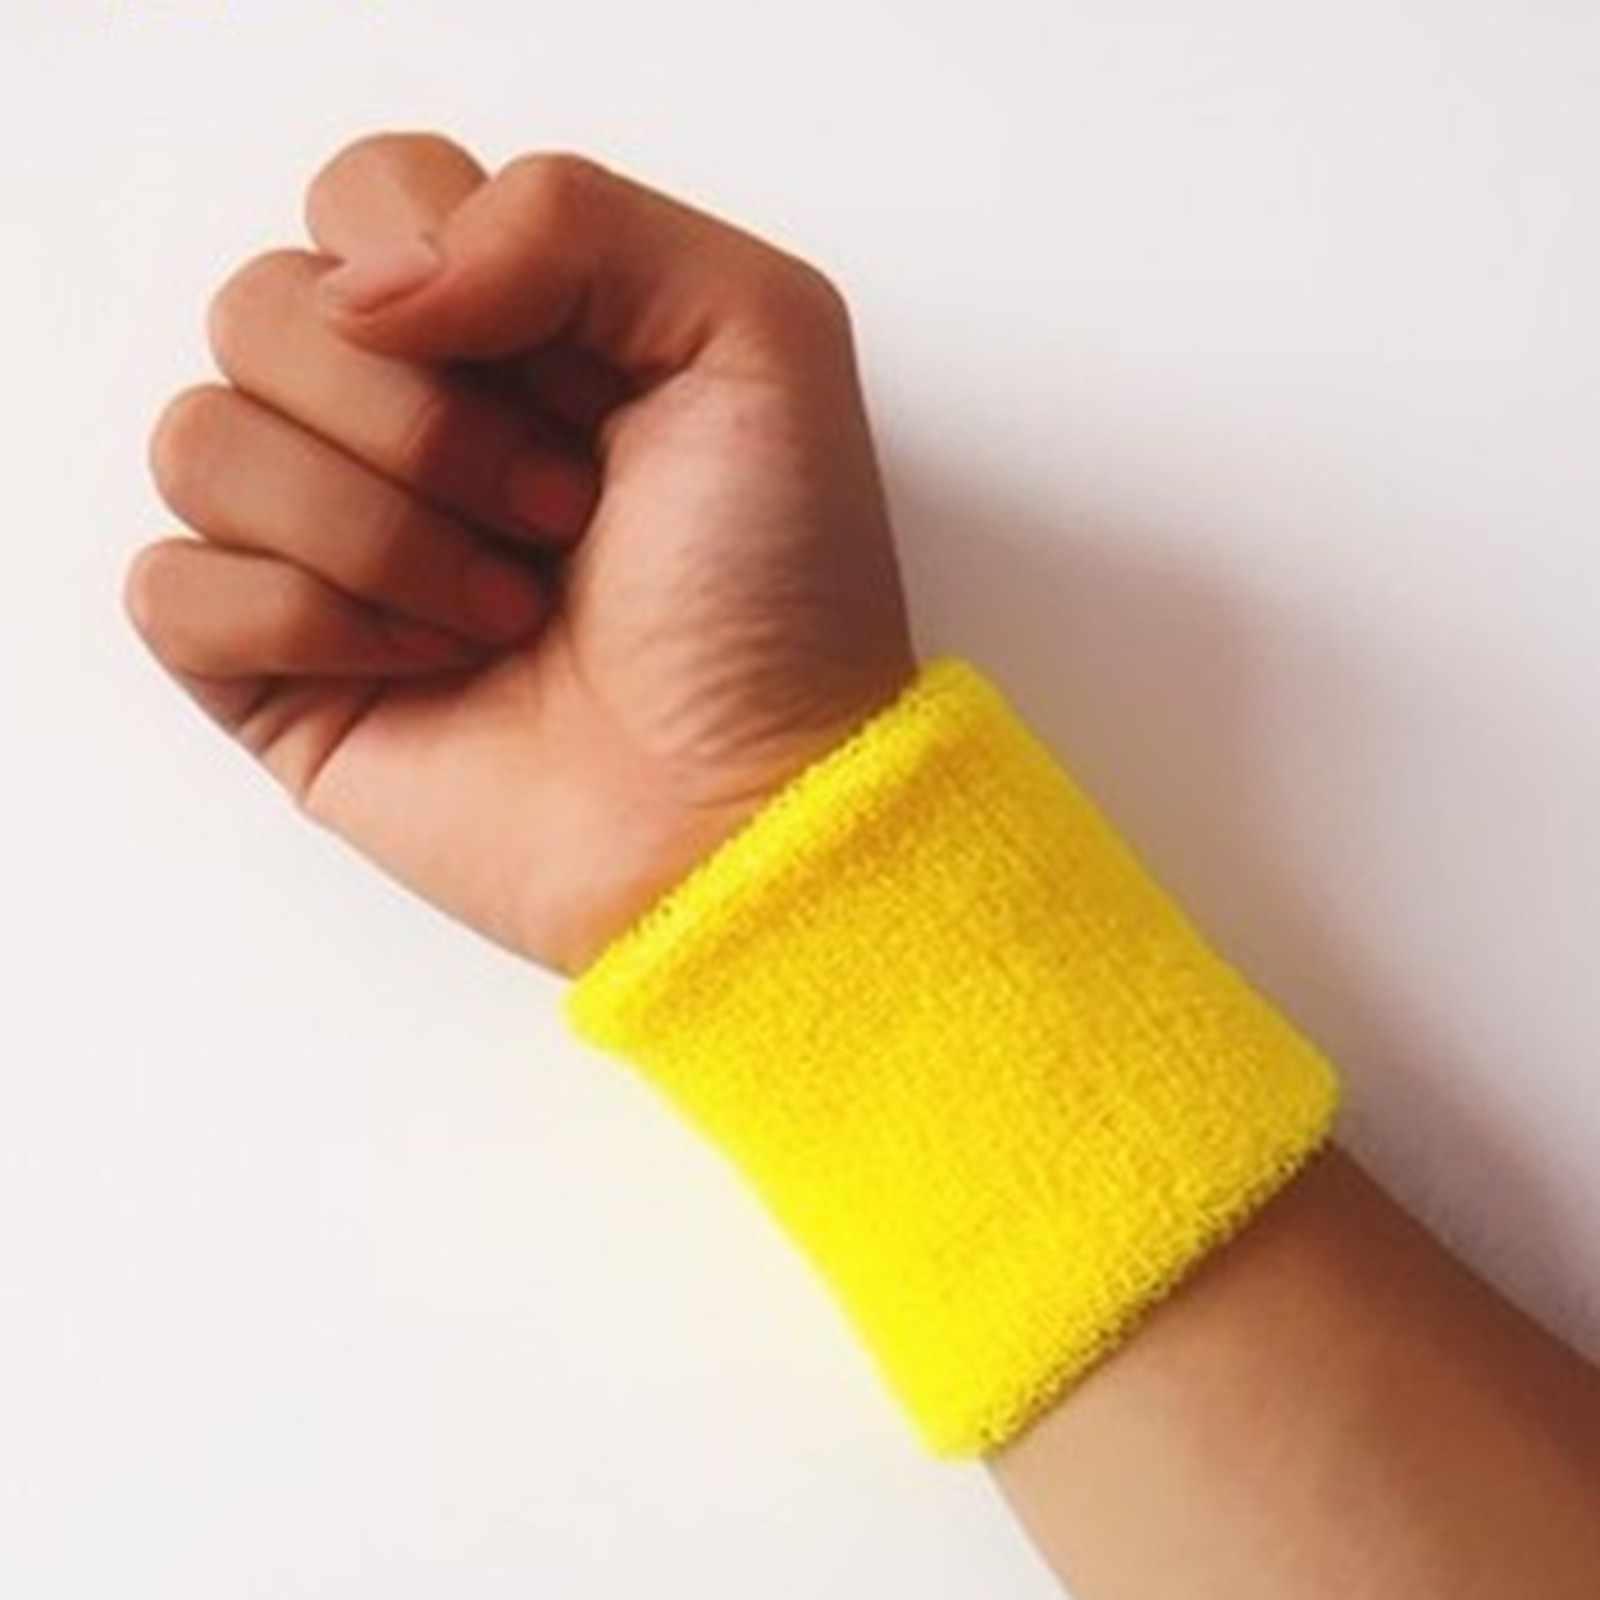 1 Buah Gelang Olahraga Pita Penahan Keringat Tangan Band Keringat Pergelangan Tangan Penopang Brace Membungkus Penjaga Gym Bola Basket Bola Voli